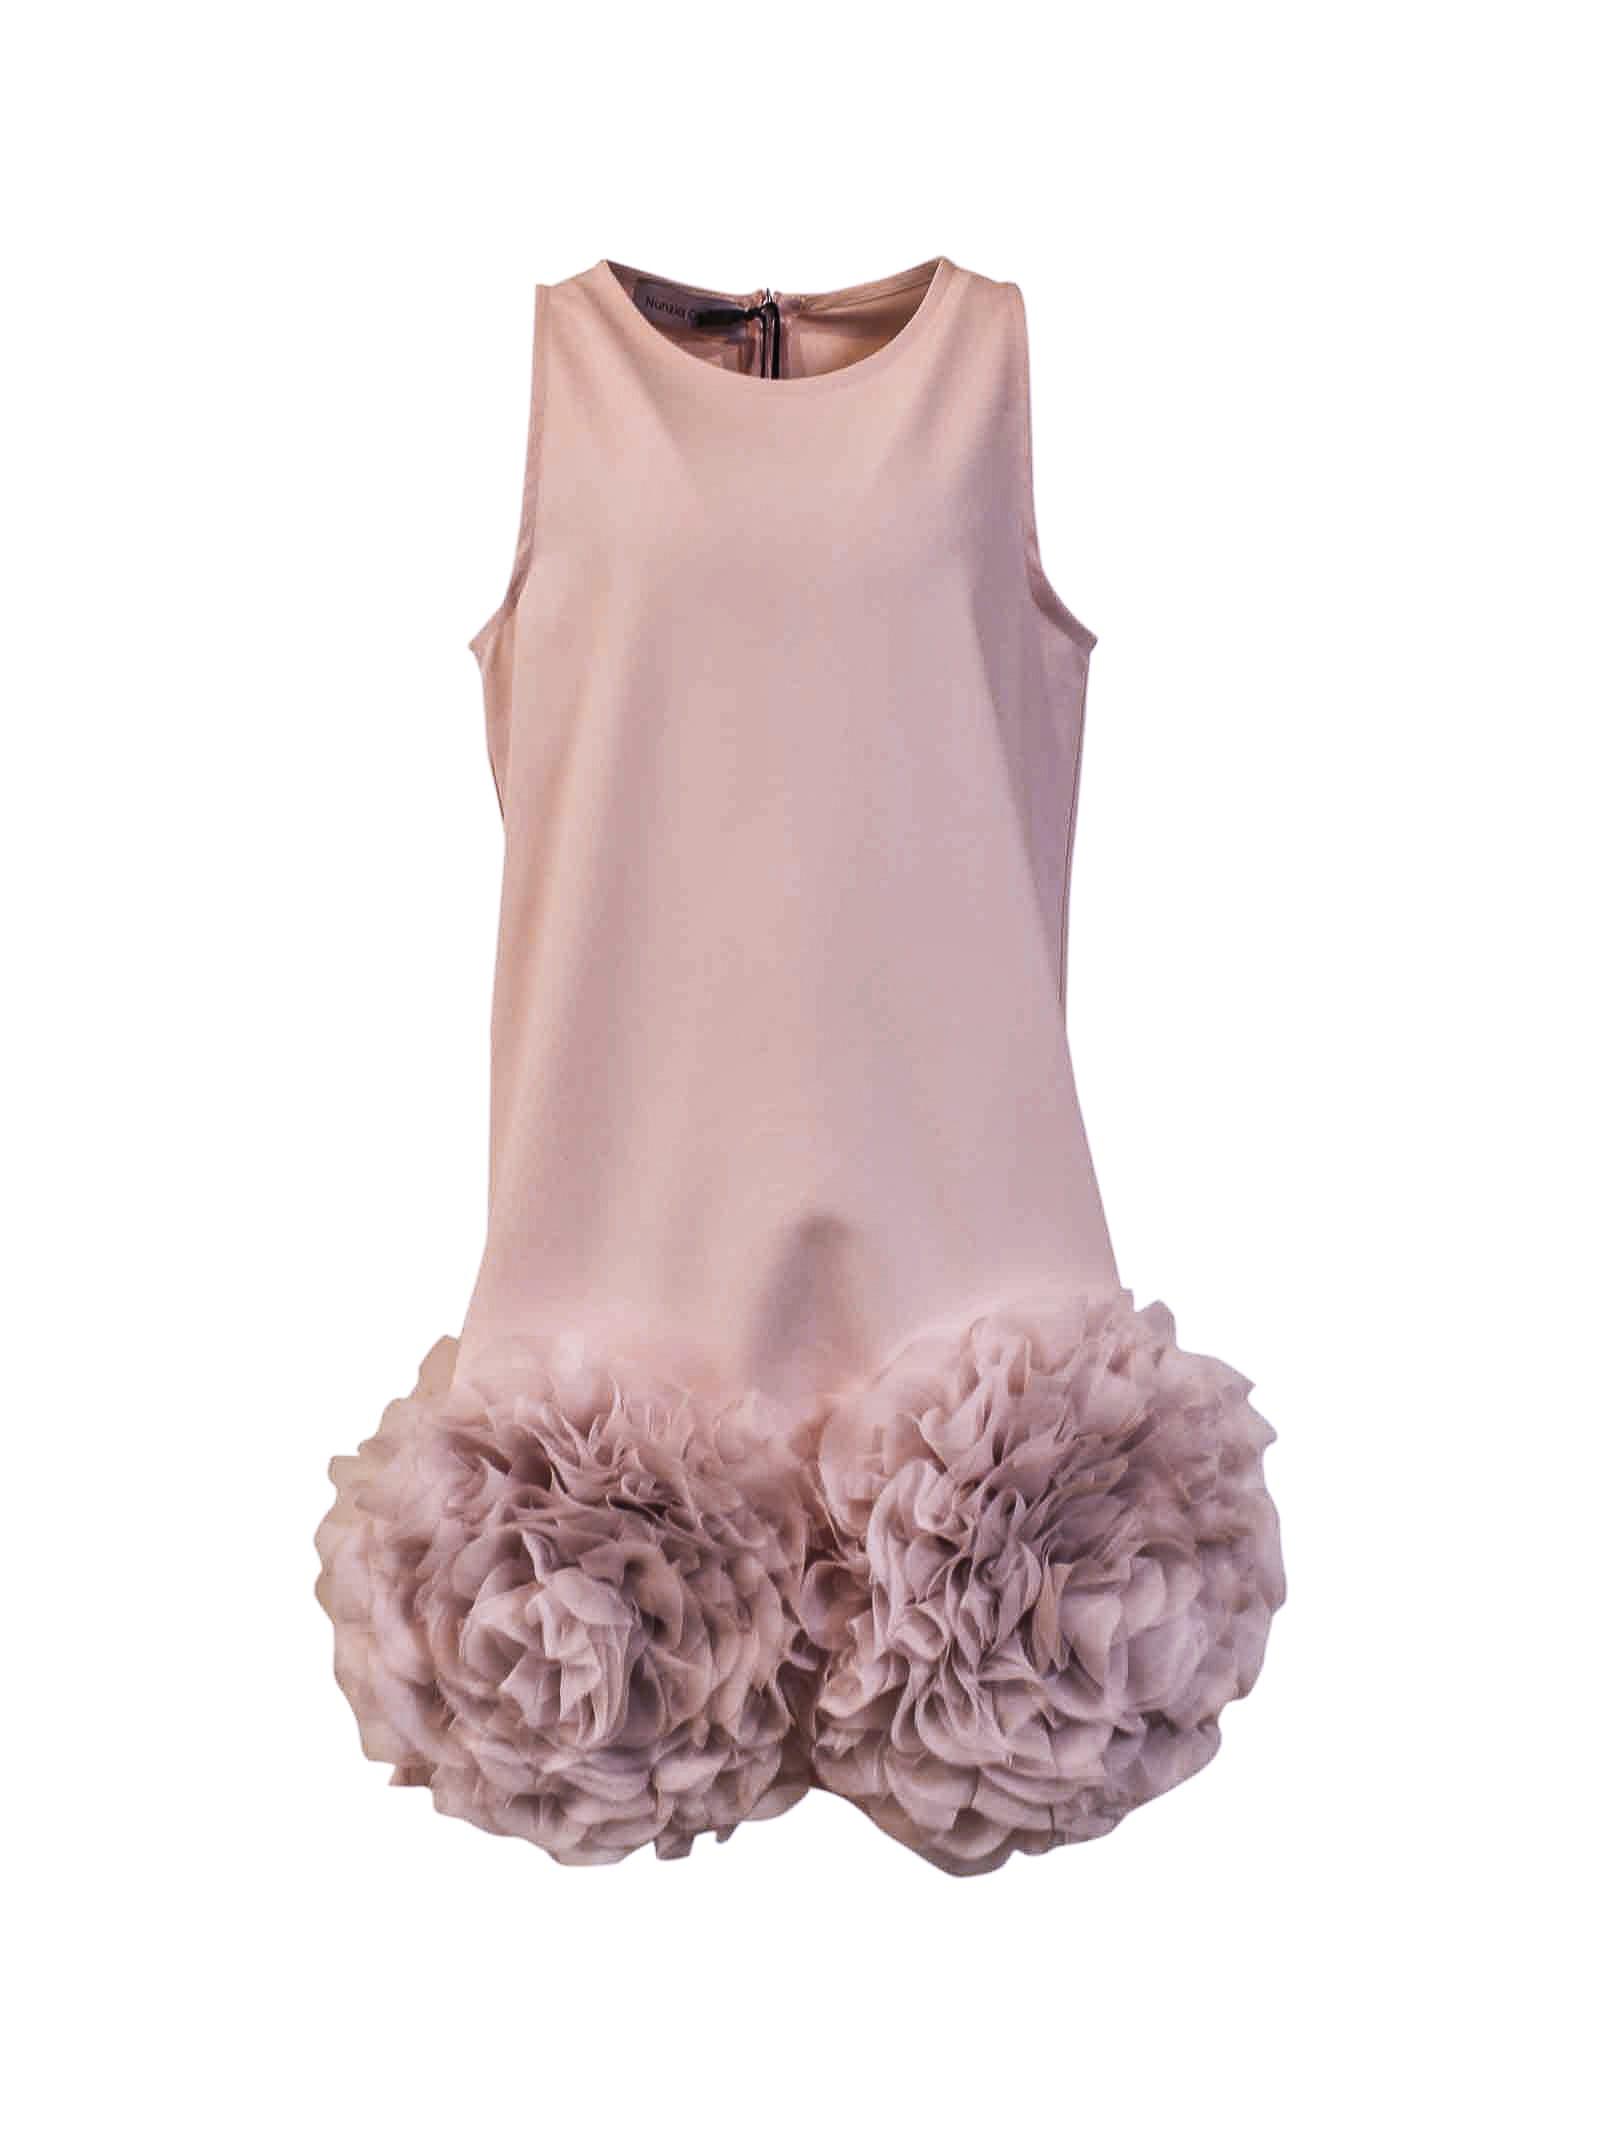 Buy Nunzia Corinna Heavy Pink Bell-shaped Crepe Teen Dress online, shop Nunzia Corinna with free shipping